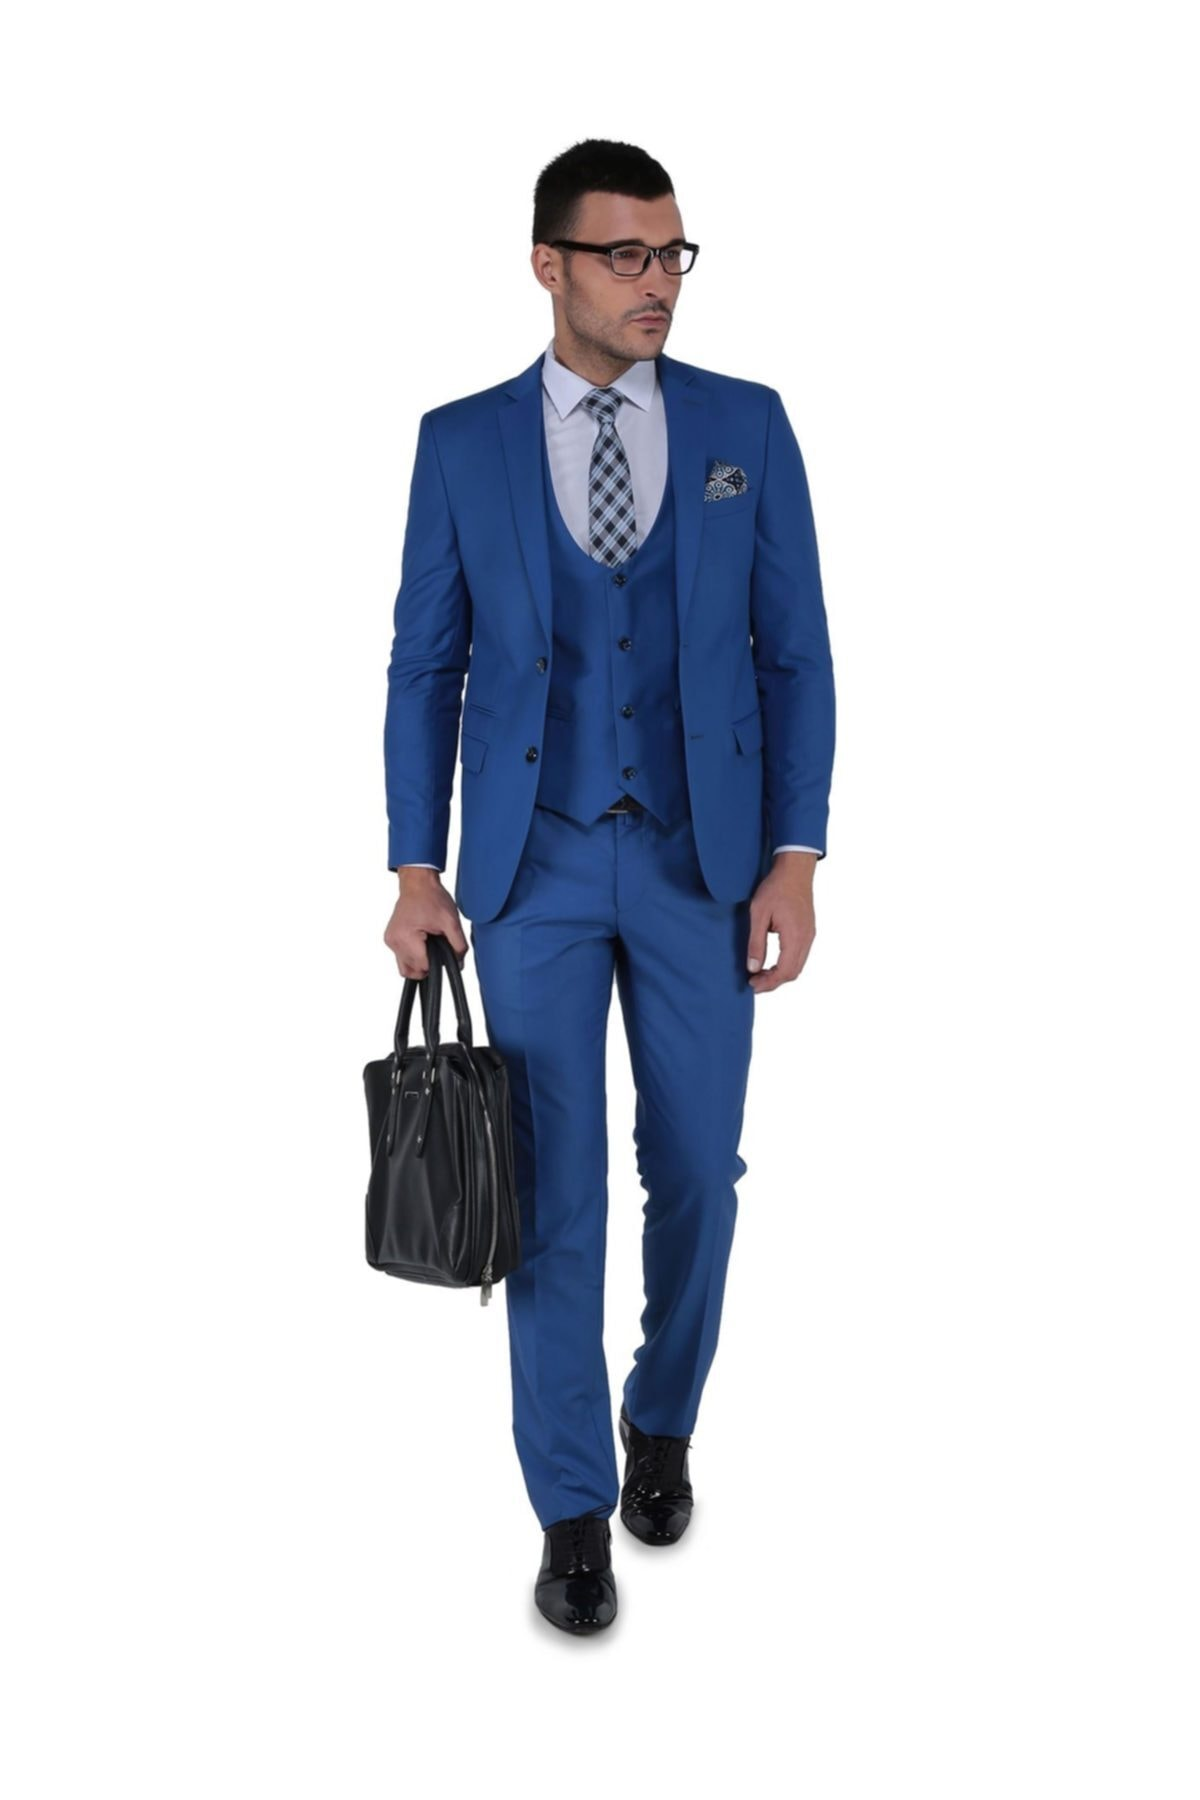 Buenza Erkek Akf Mono Yelekli Dar Kalıp Takım Elbise 1